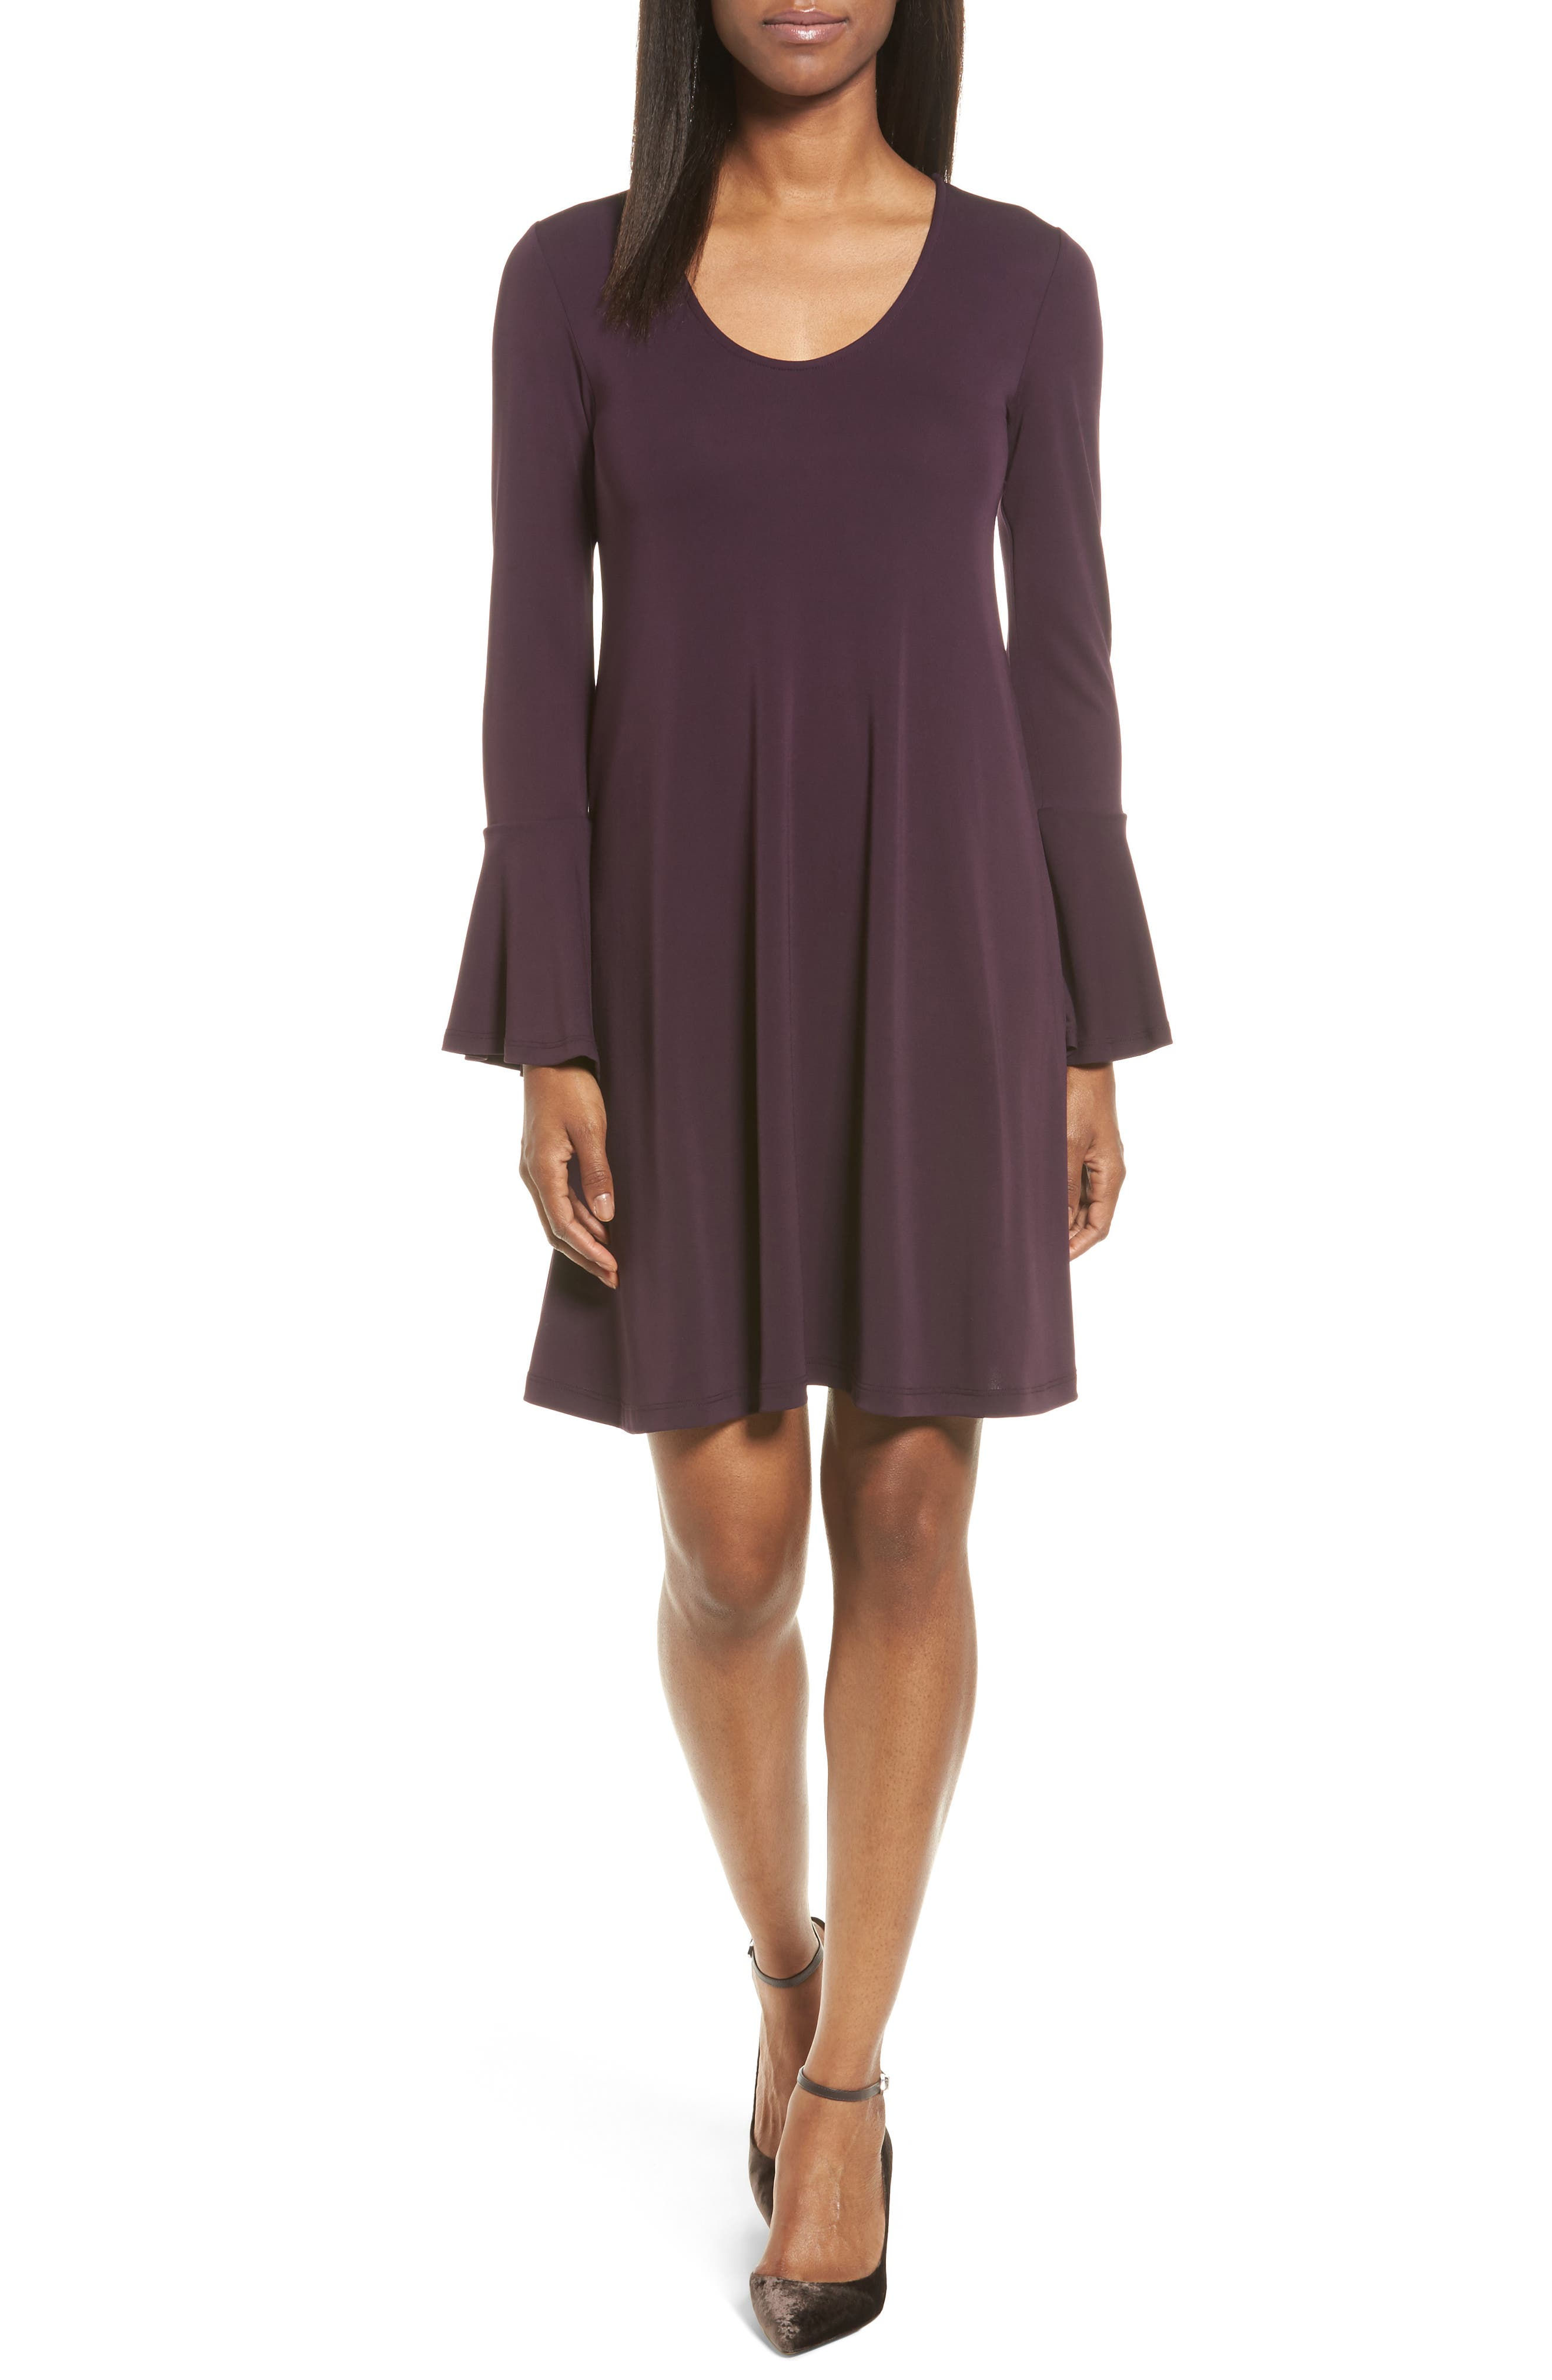 Main Image - Karen Kane Taylor Flare Sleeve A-Line Dress (Regular & Petite)